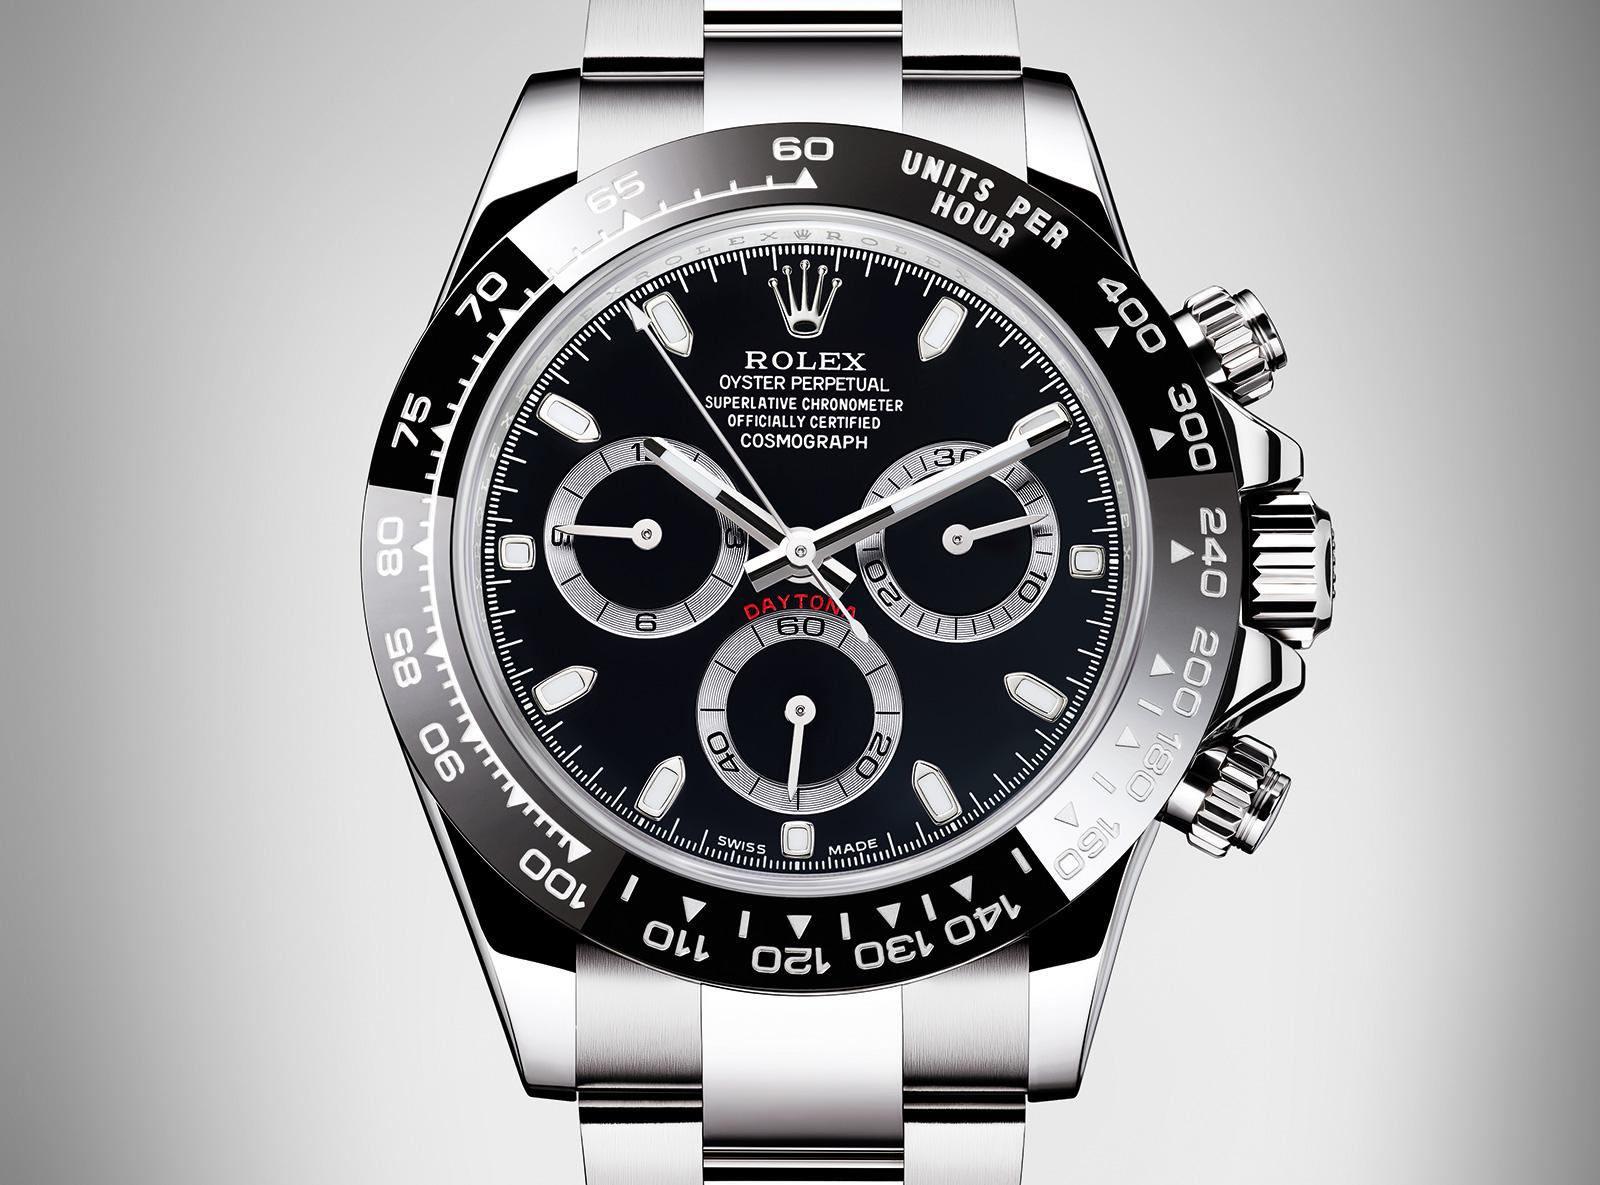 Rolex Daytona Steel Ceramic bezel black dial